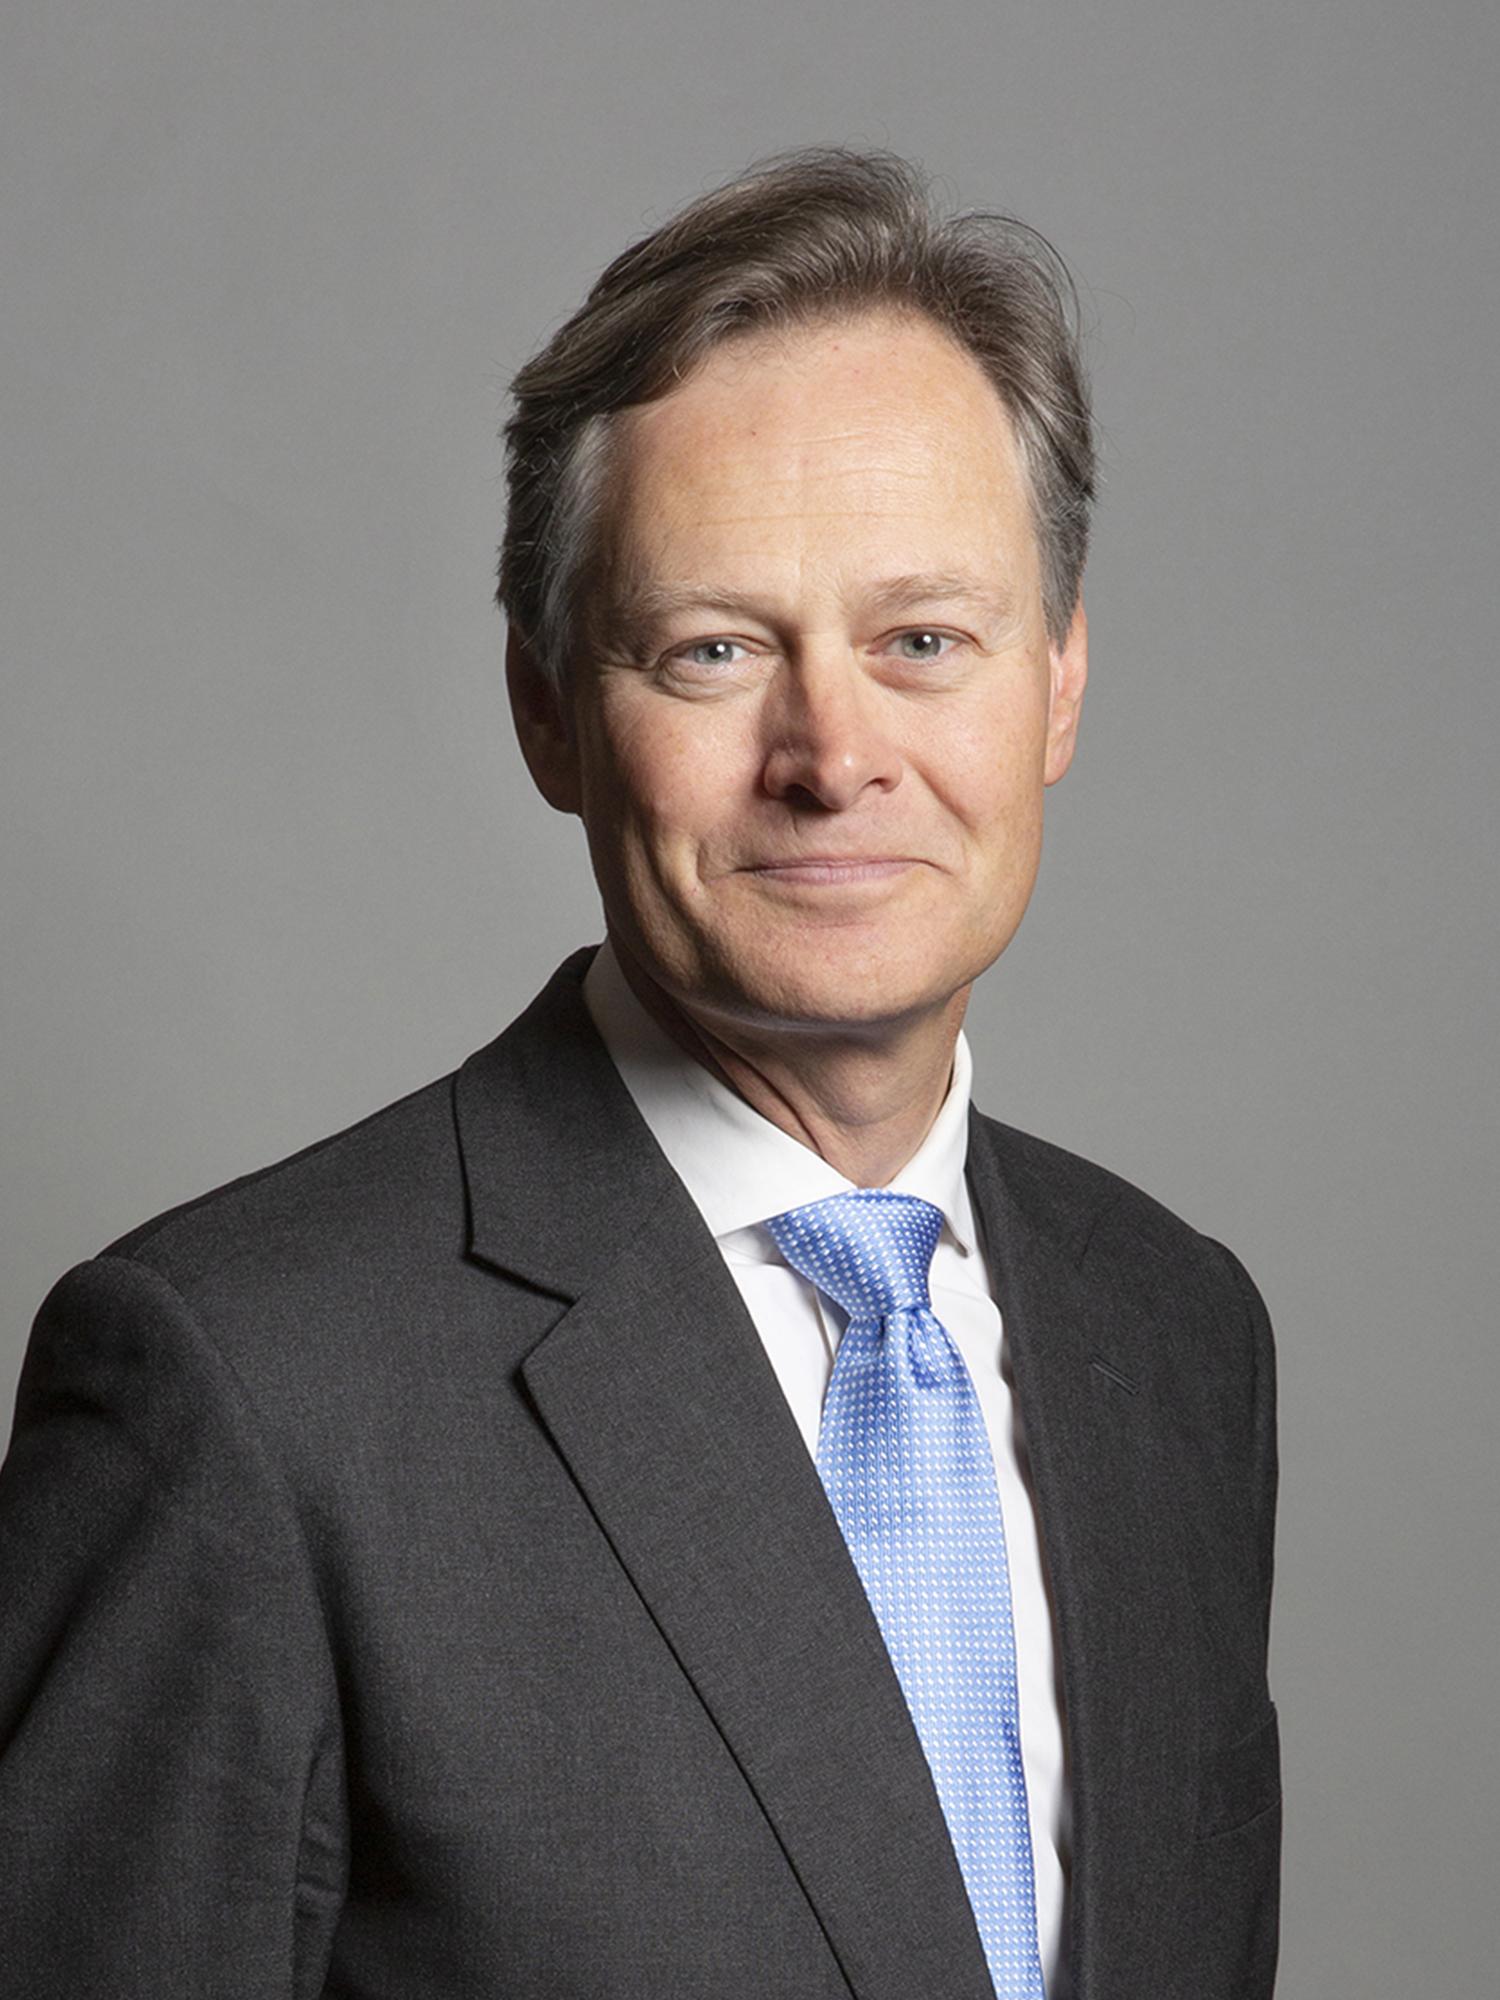 Matthew Offord - Wikipedia